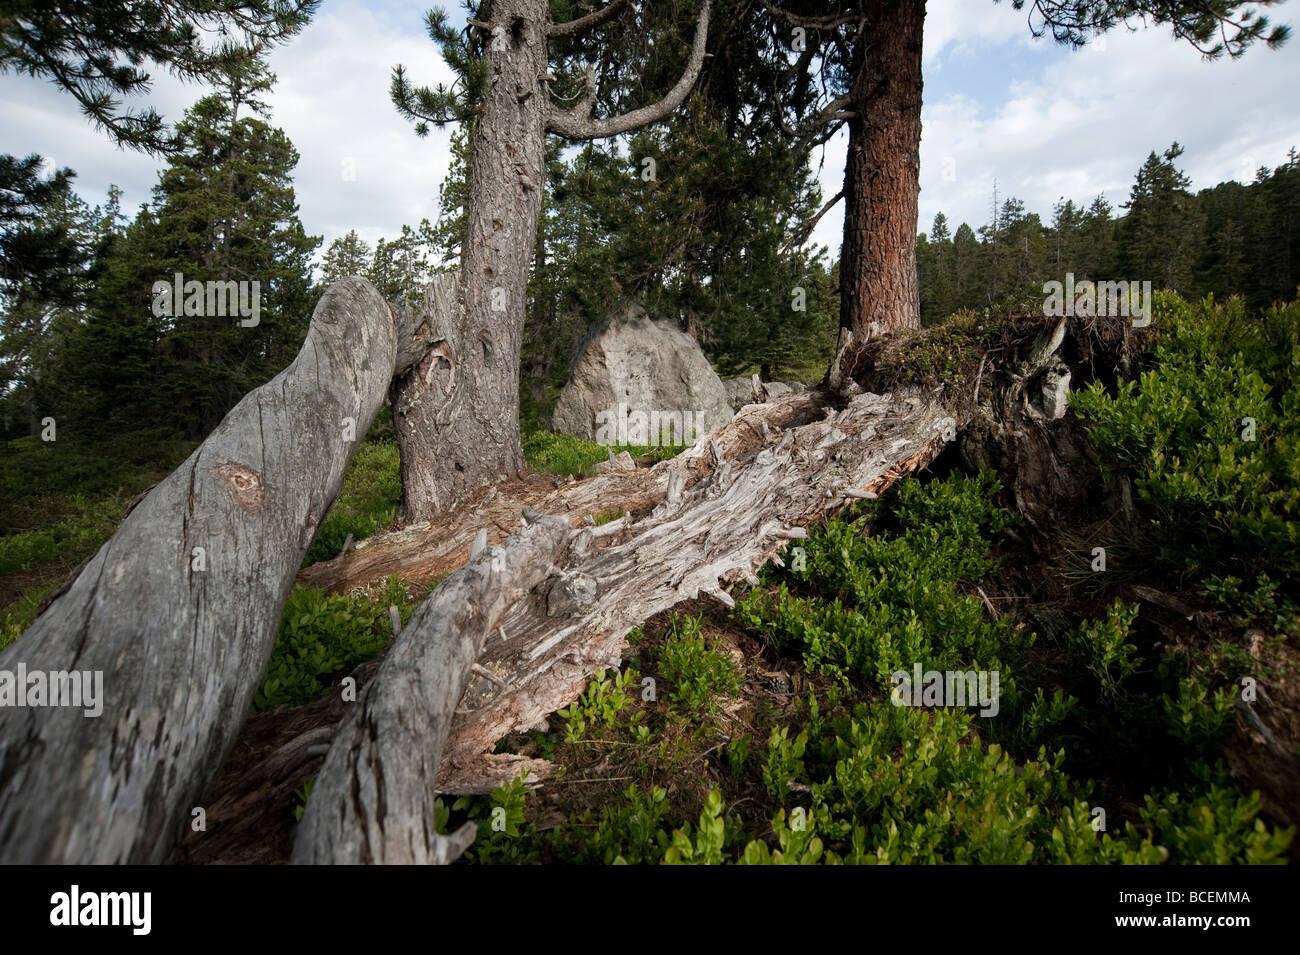 Niederhorn Beatenberg Berner Oberland Schweiz habitat for black grouse with spruce and pine trees - Stock Image